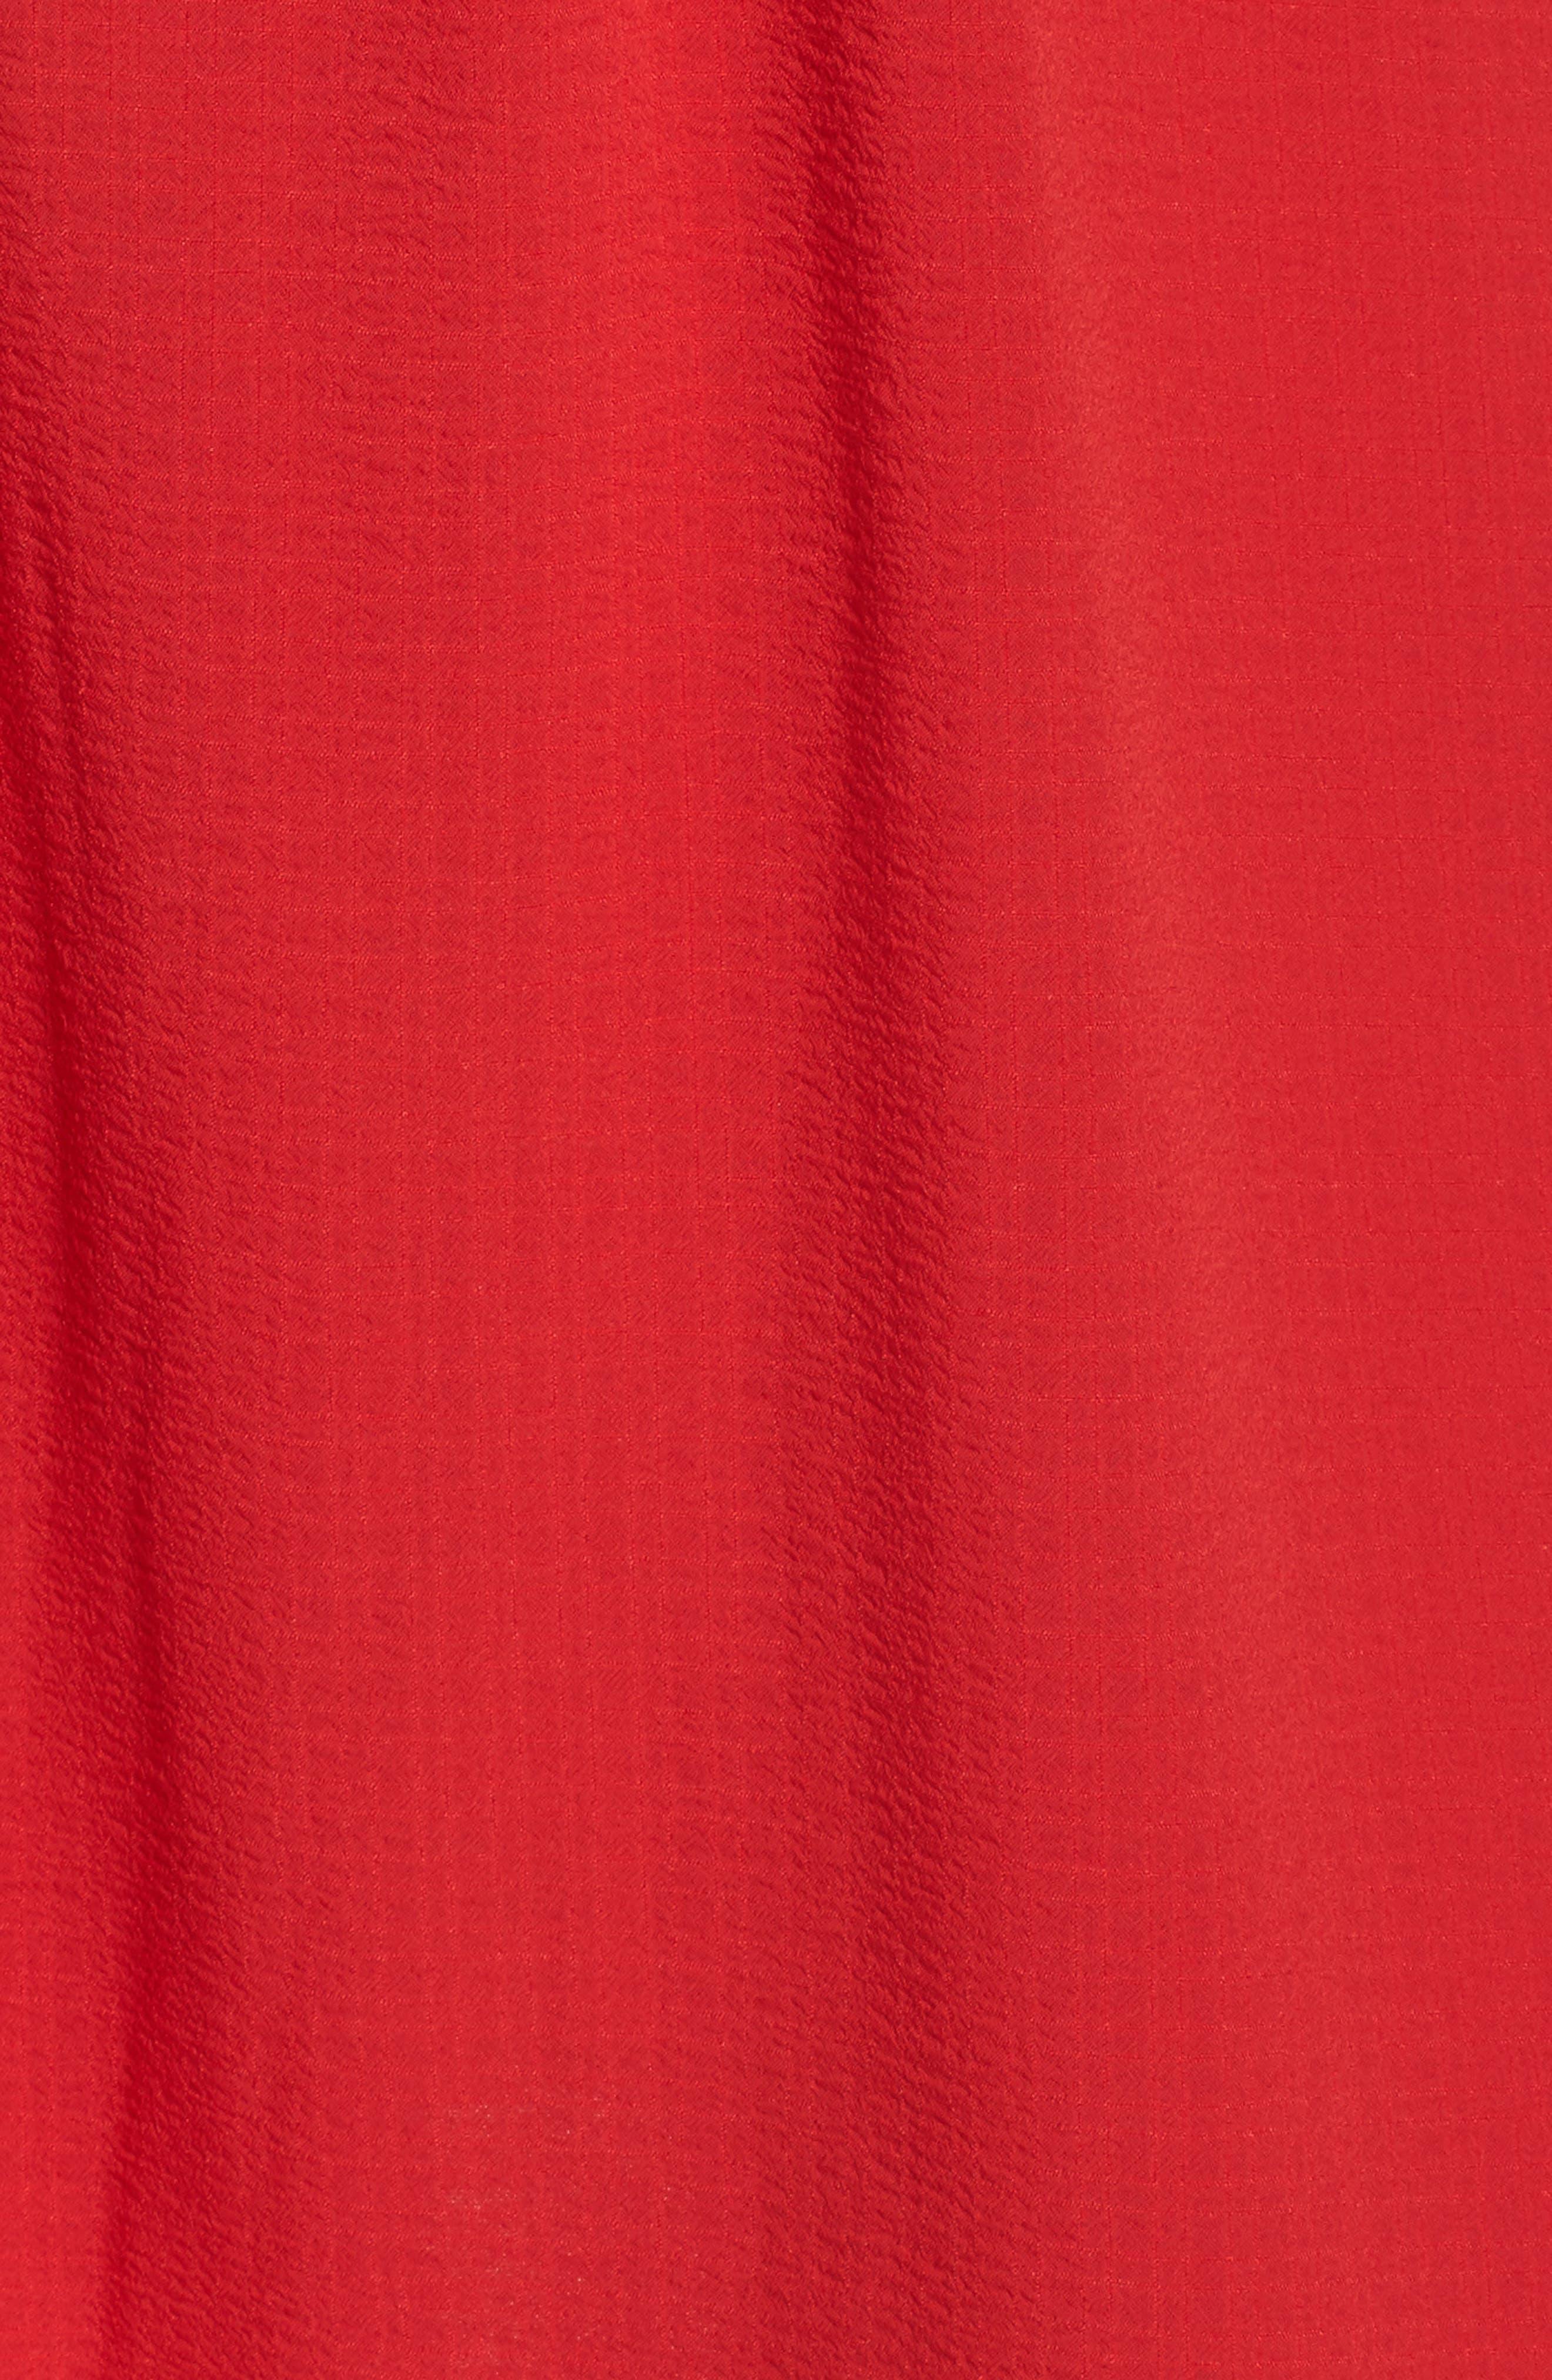 Ruffle Cold Shoulder Dress,                             Alternate thumbnail 5, color,                             Tomato